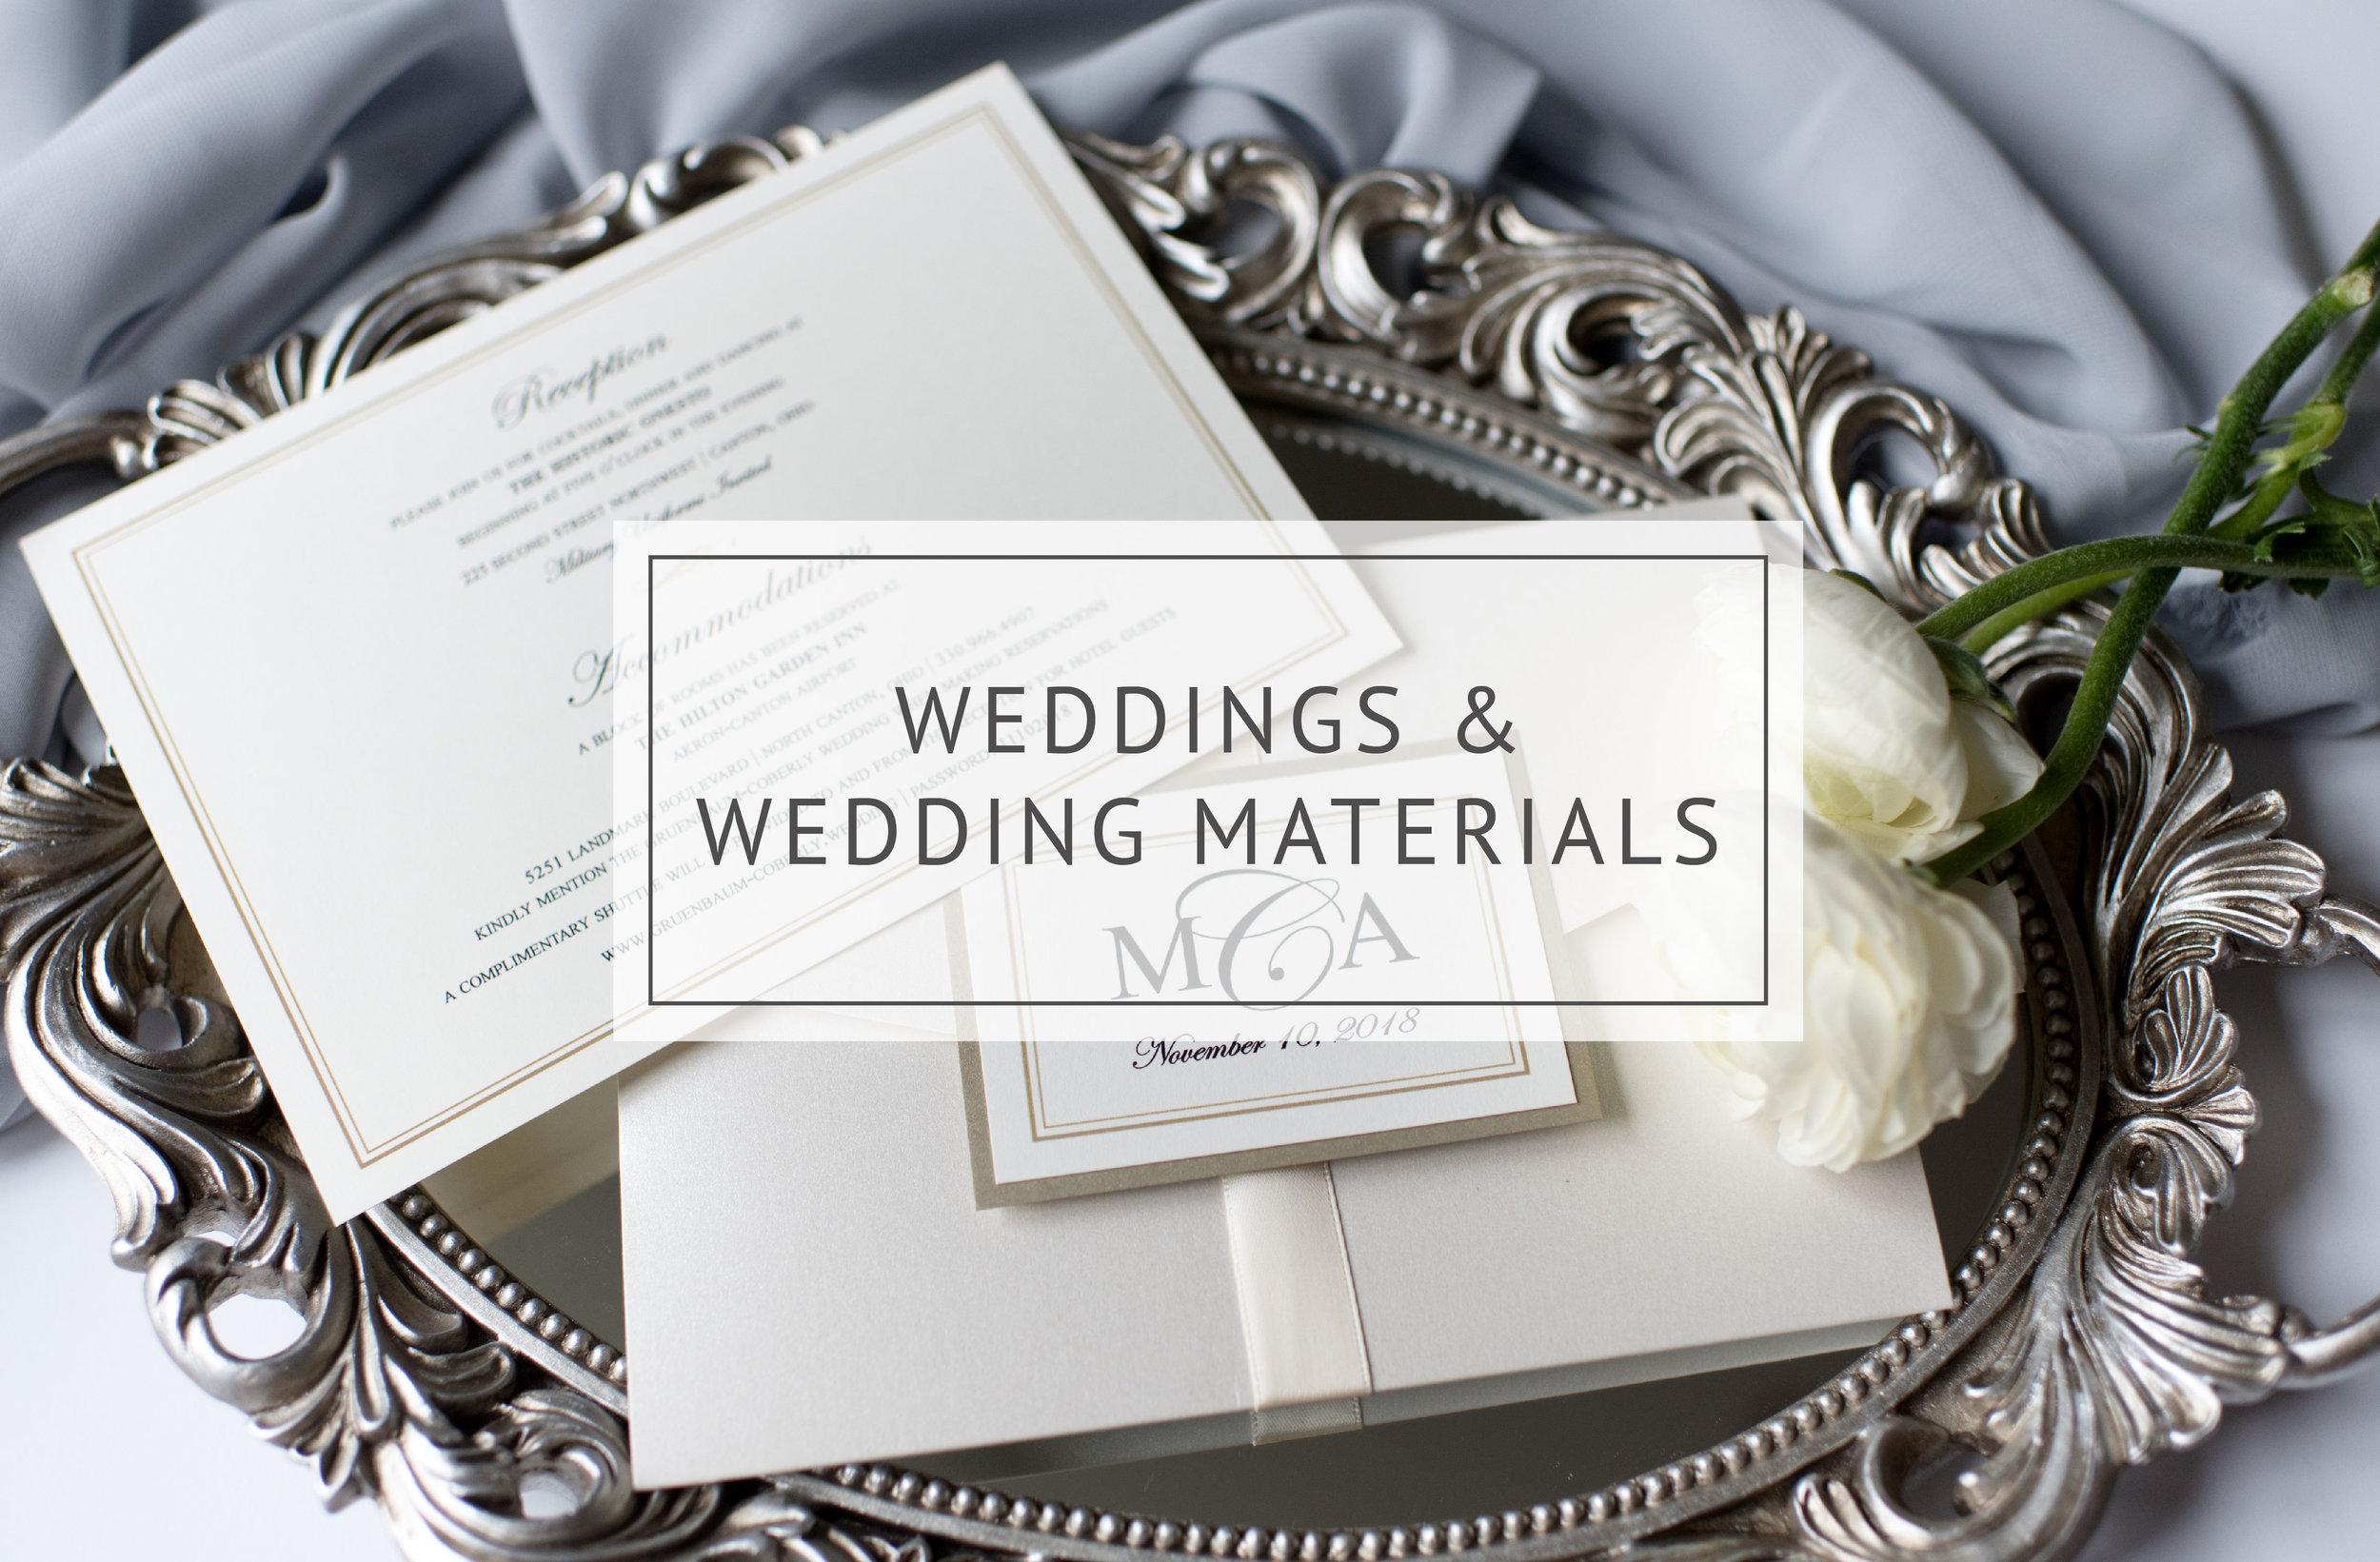 weddings and wedding materials-02.jpg